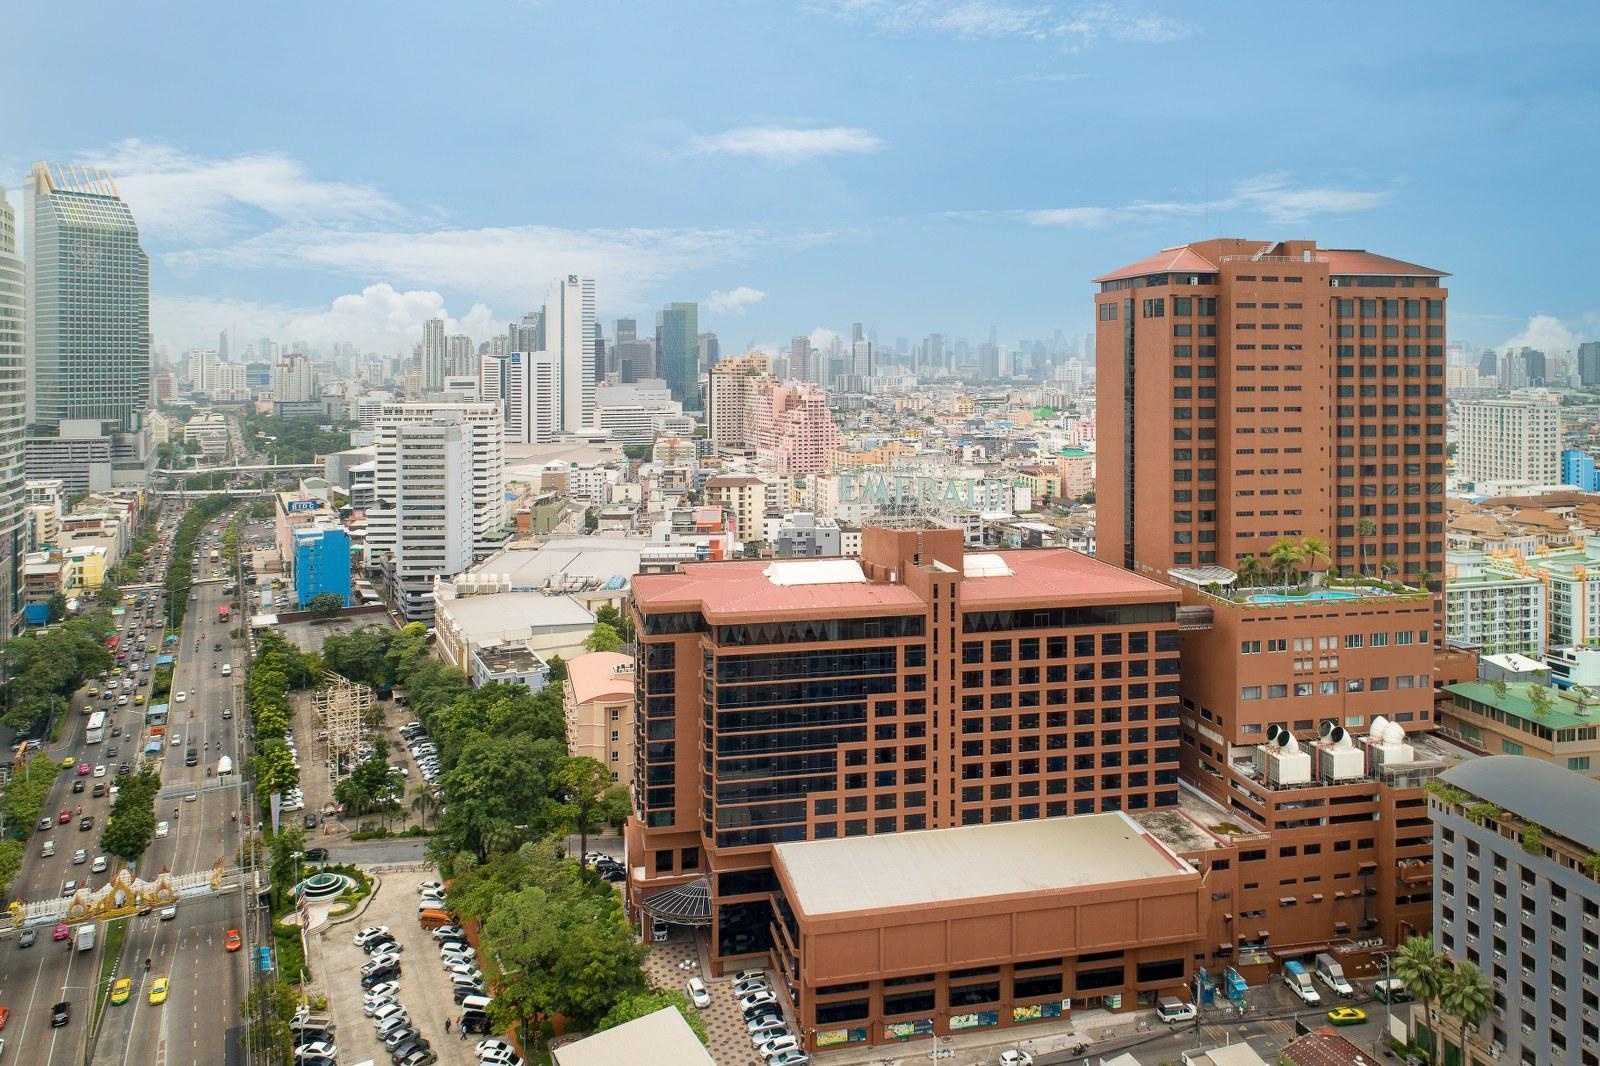 The Emerald Hotel - Bangkok โรงแรมดิ เอมเมอรัลด์ กรุงเทพฯ